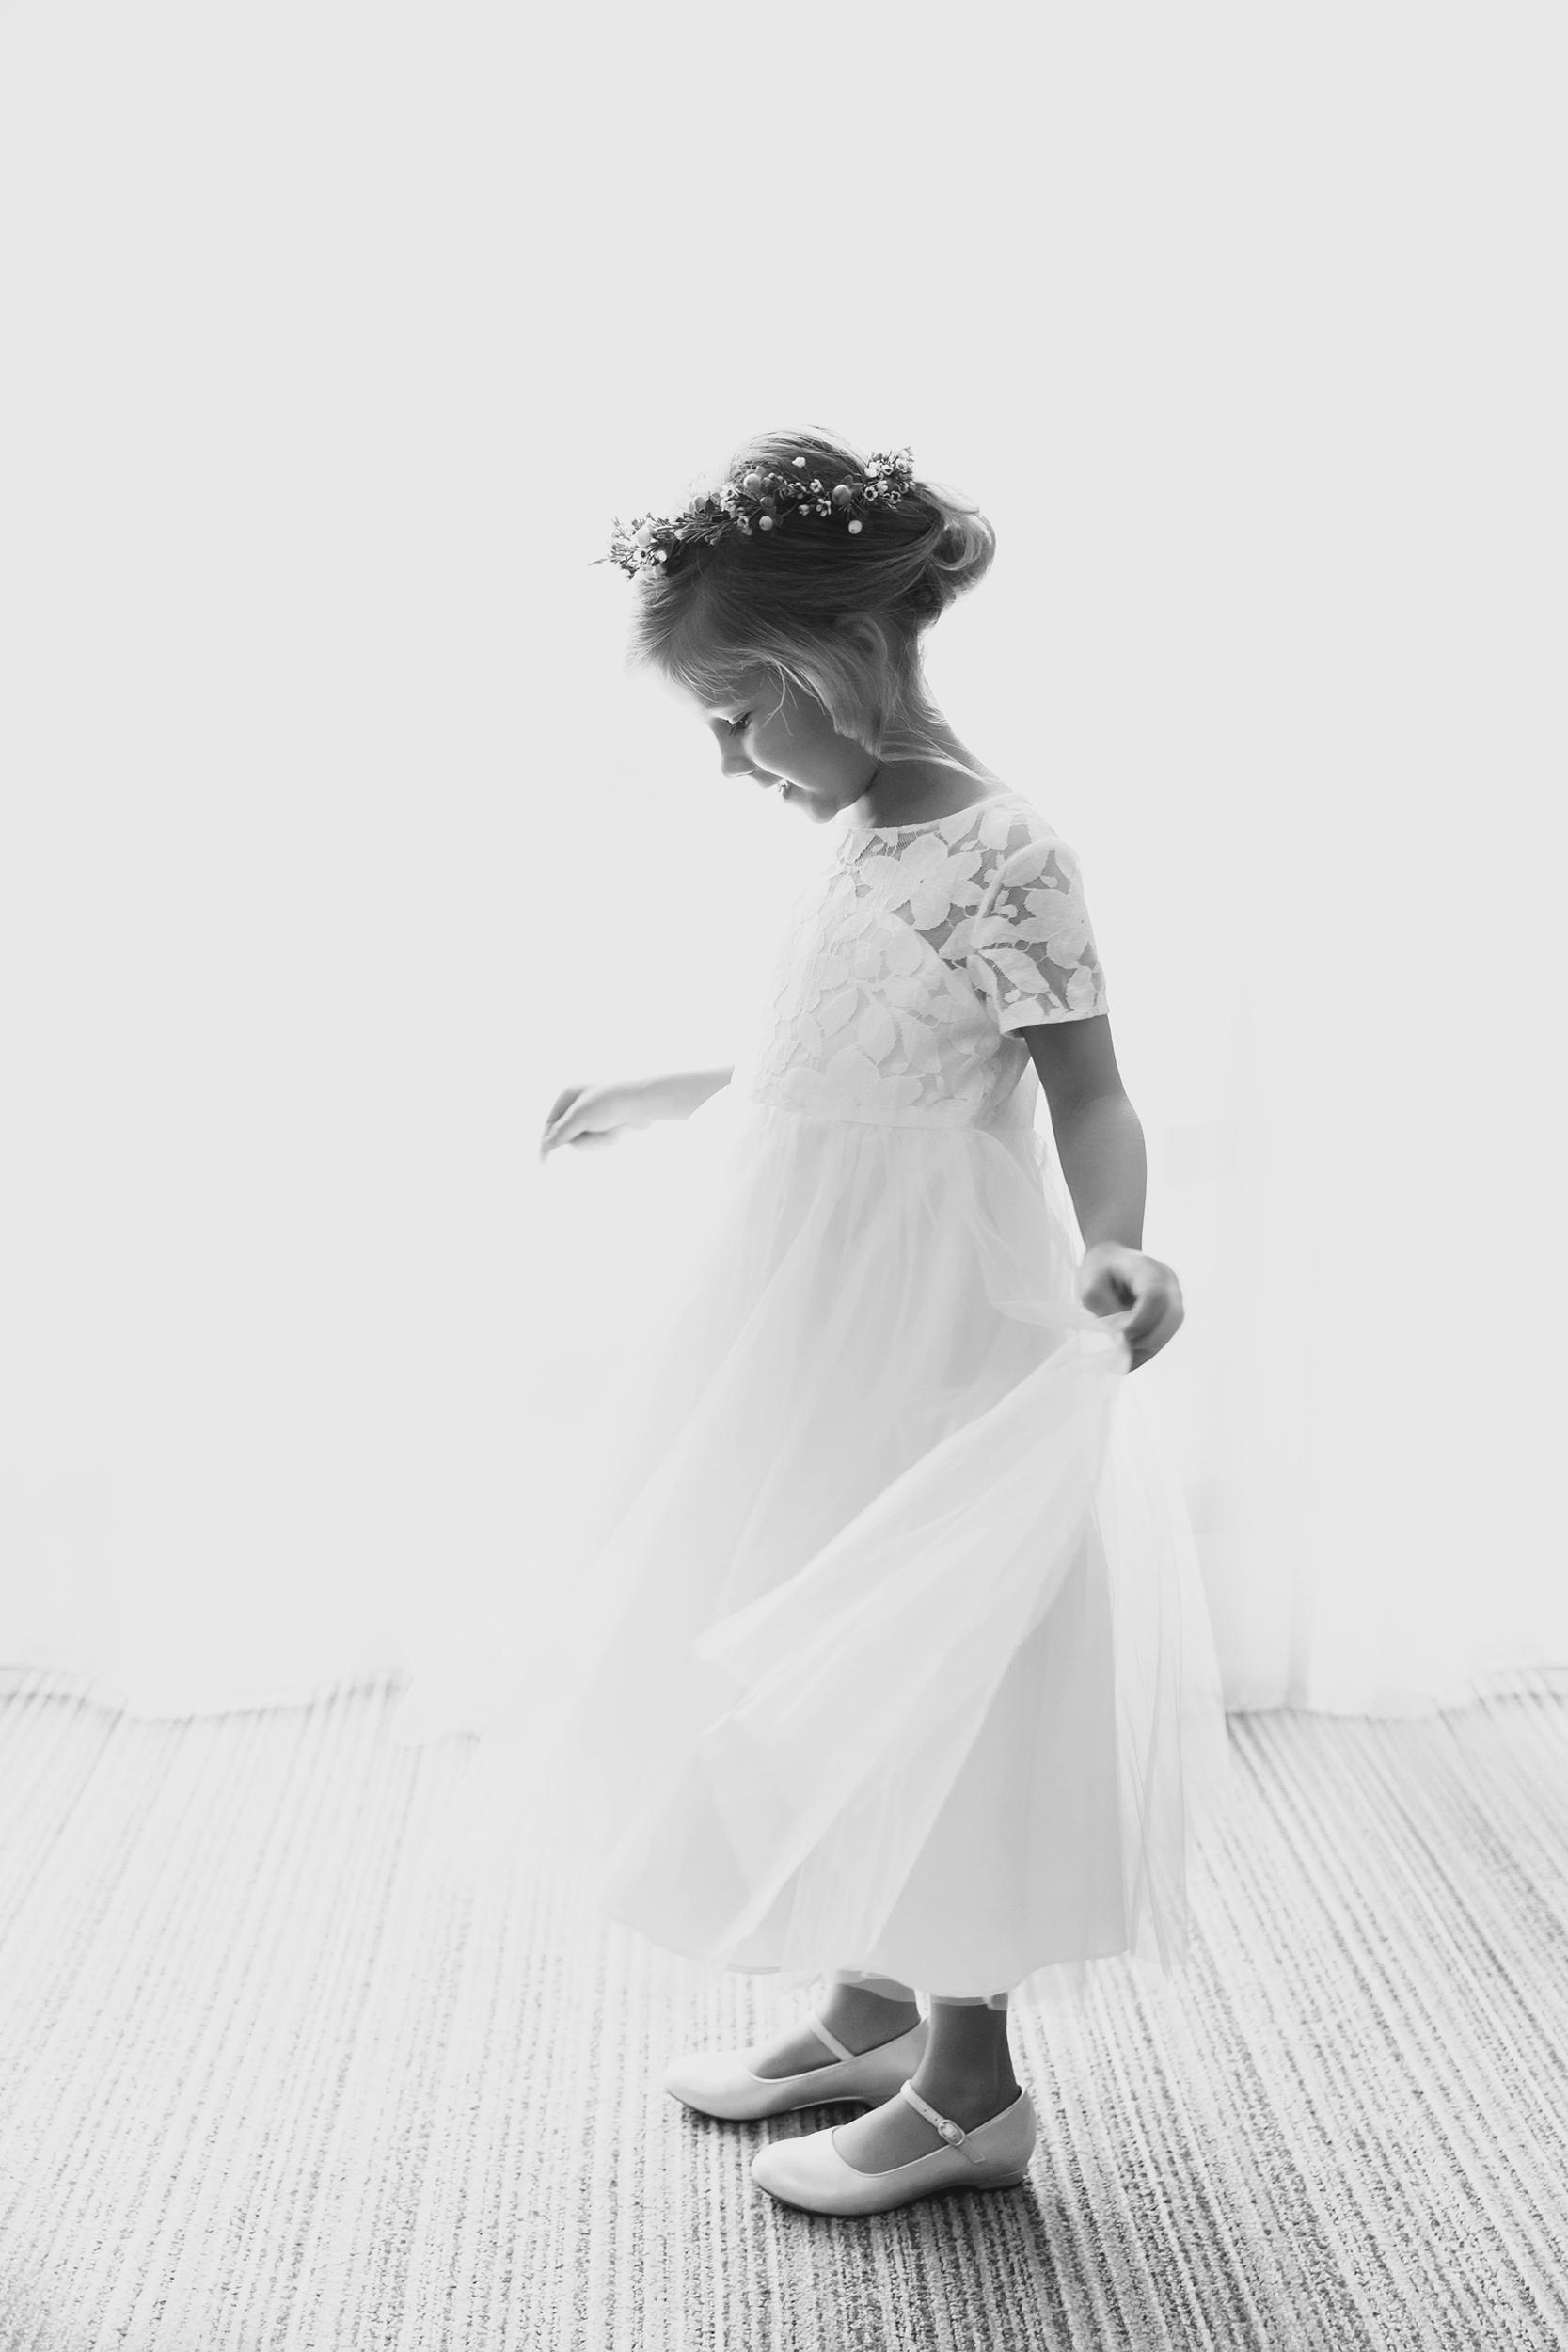 Austin_Wedding_Photographer_Kimberly_Brooke_Photographic_185.jpg